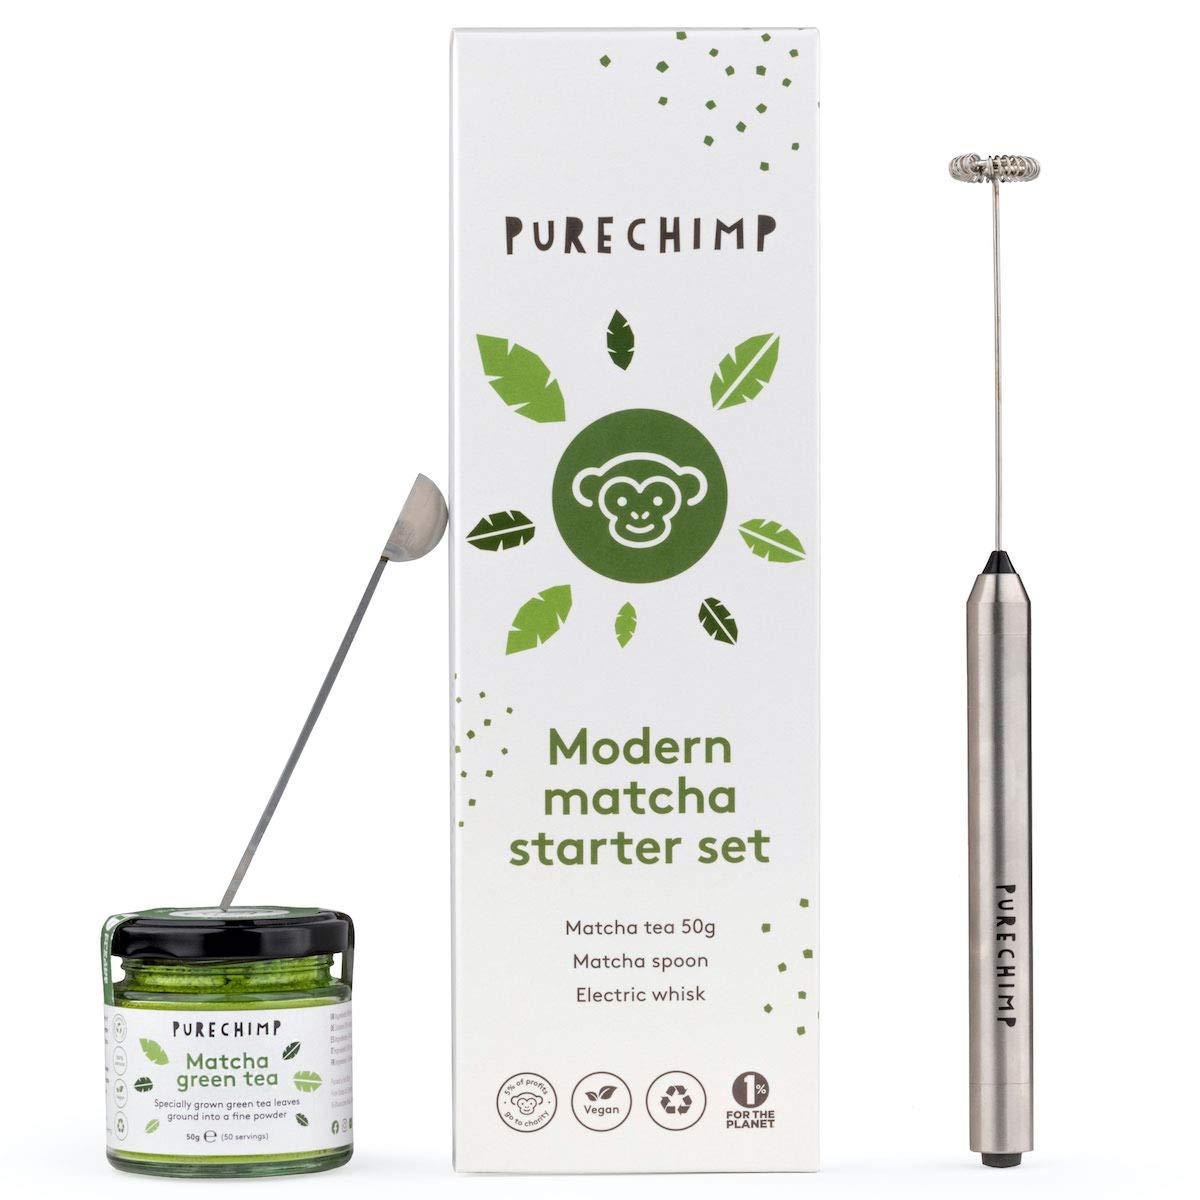 Modern Superior Matcha Starter Set by PureChimp + 50g Electr San Francisco Mall - Tea